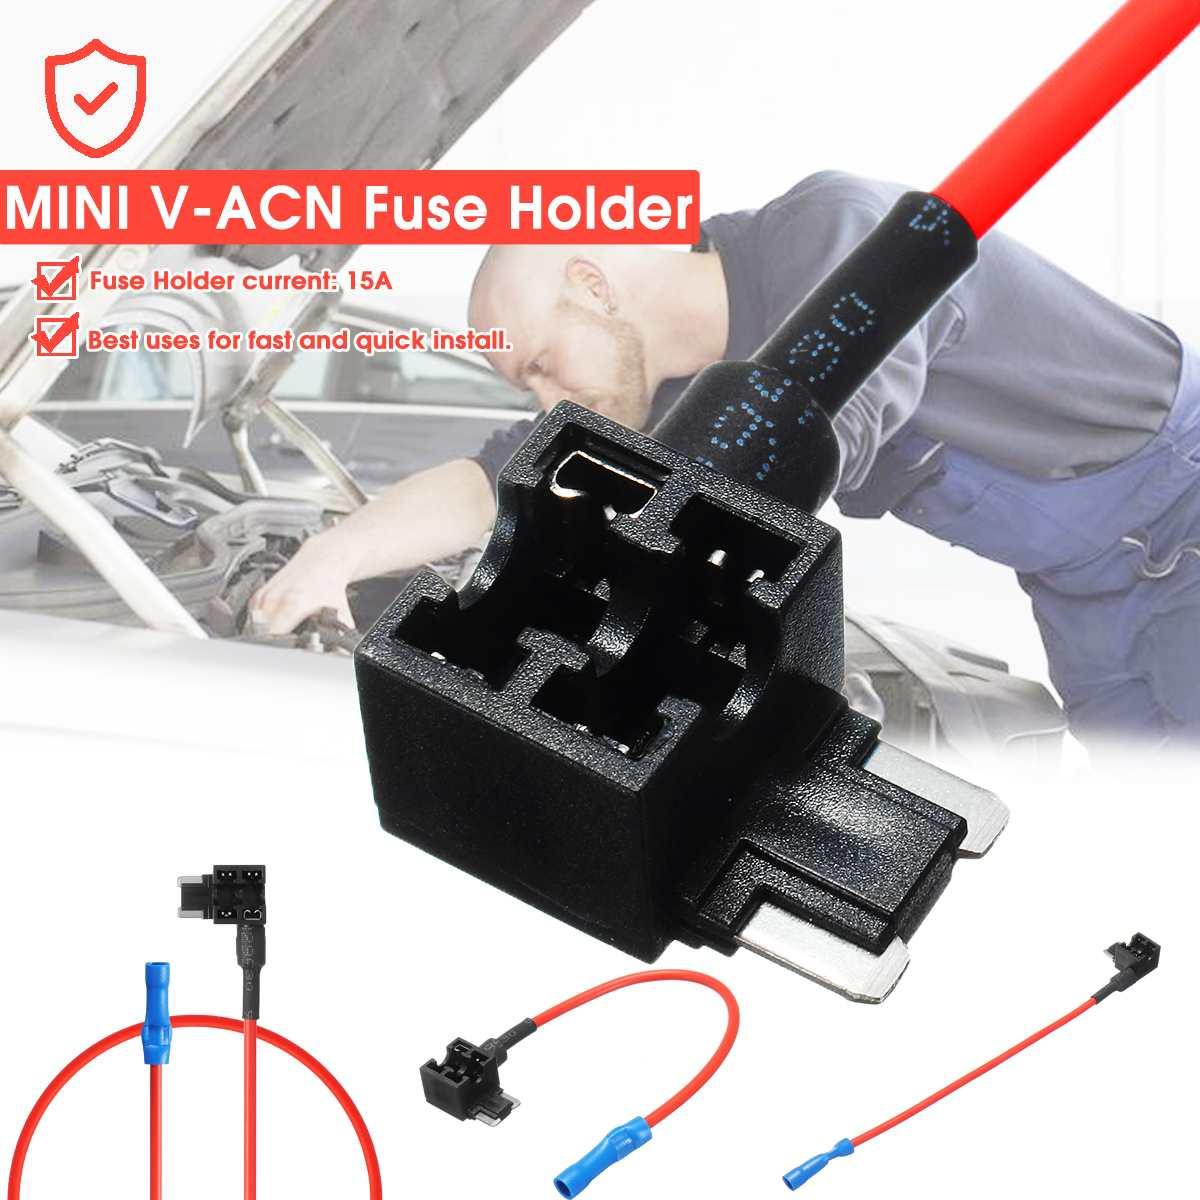 V Acn 15a Fuse Holder Car Add Circuit Piggy Back Tap Standard Ato Atc Blade Fuse Boxe Holder Set